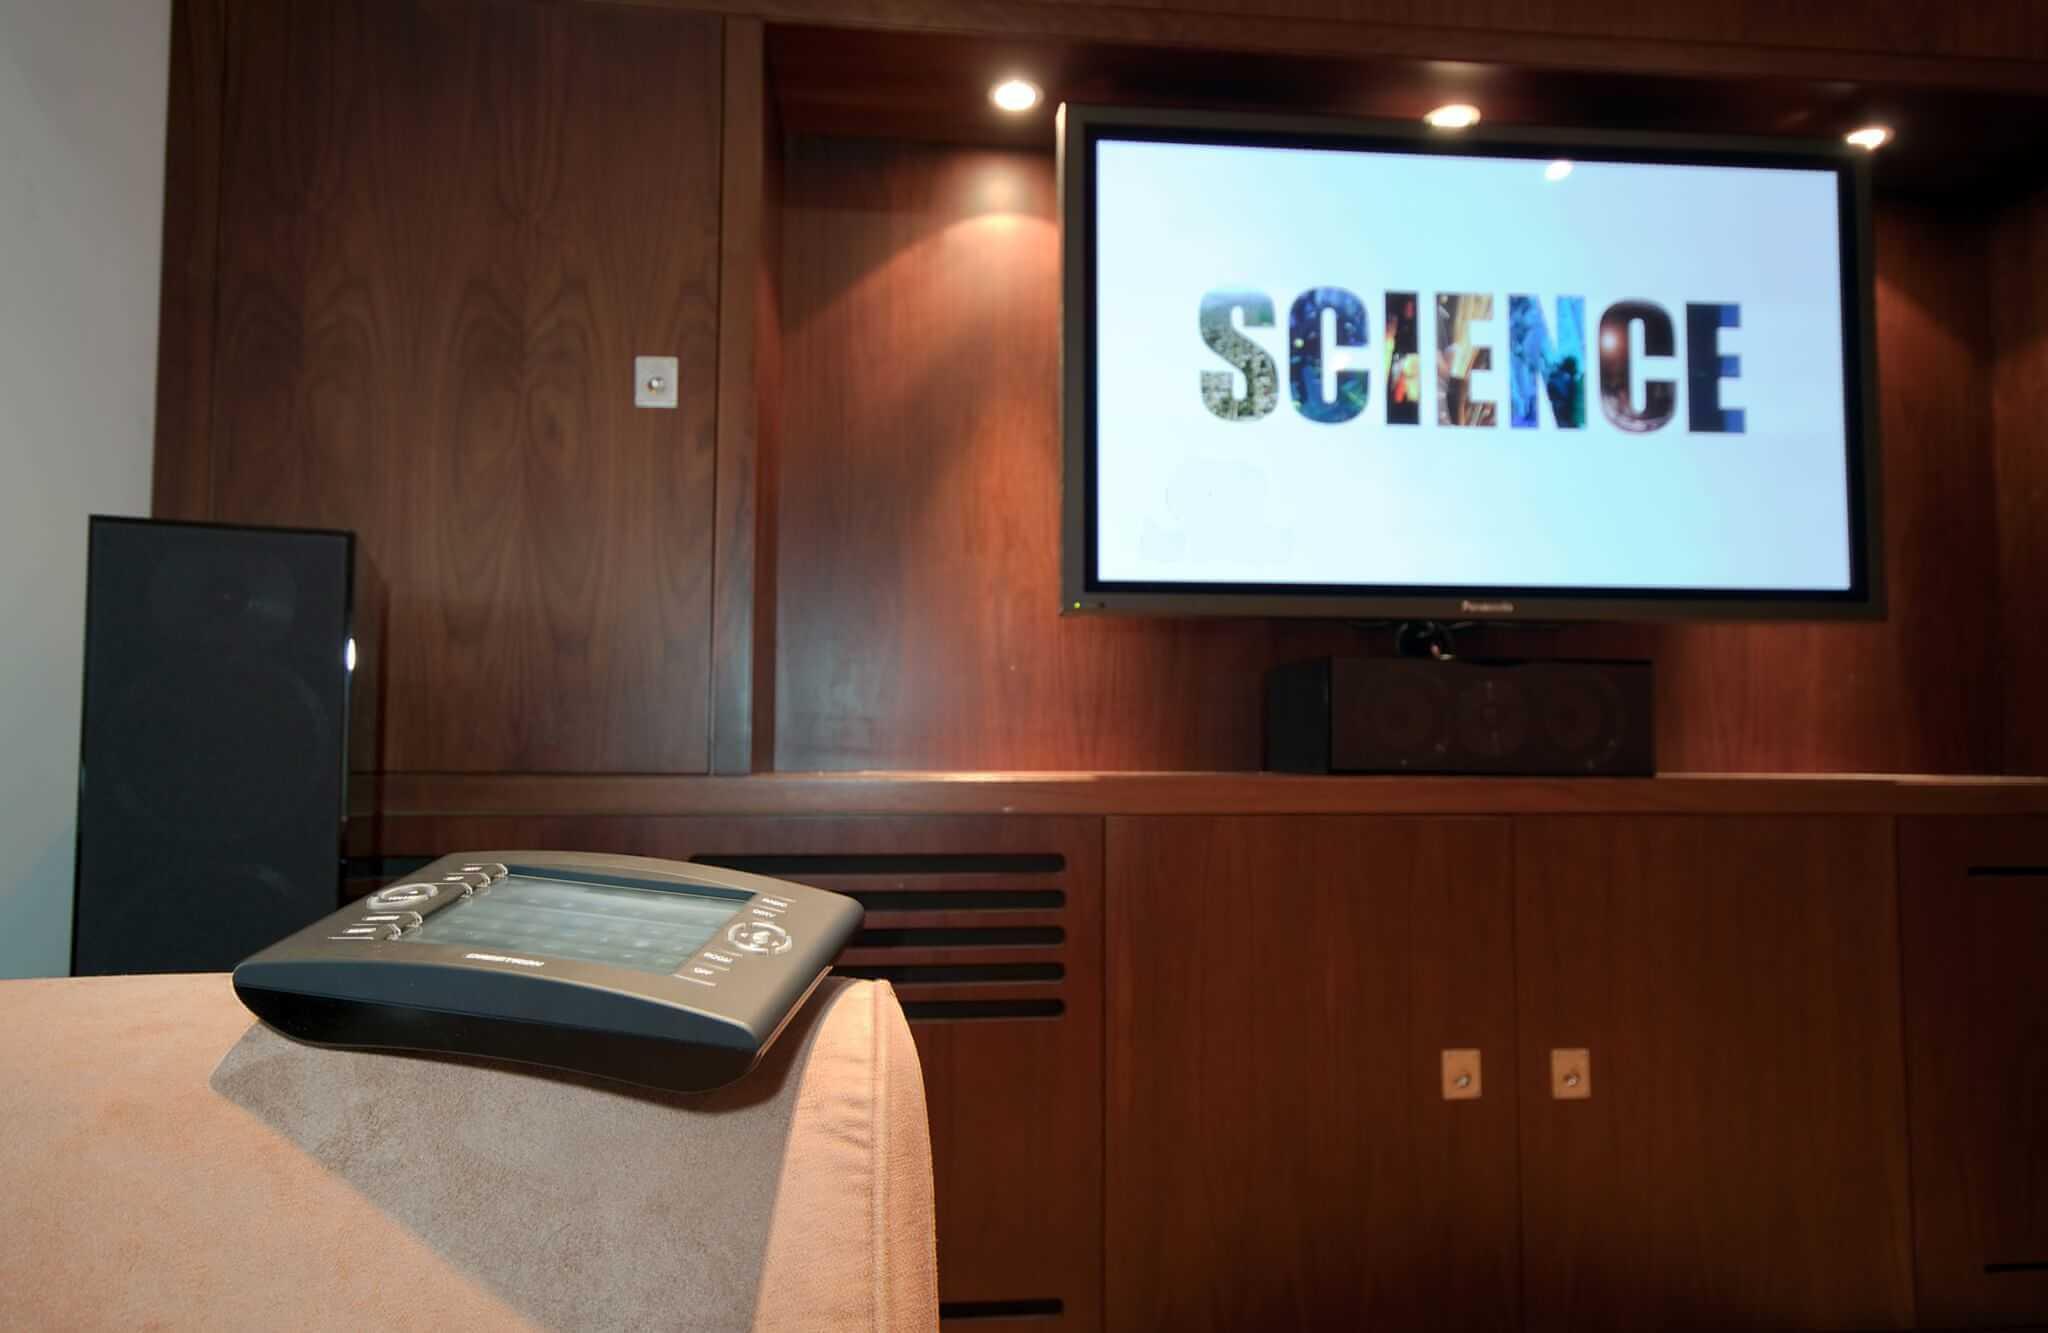 Basement Home Cinema Installation 2 - Case Study: Basement Home Cinema Installation Baker St, London